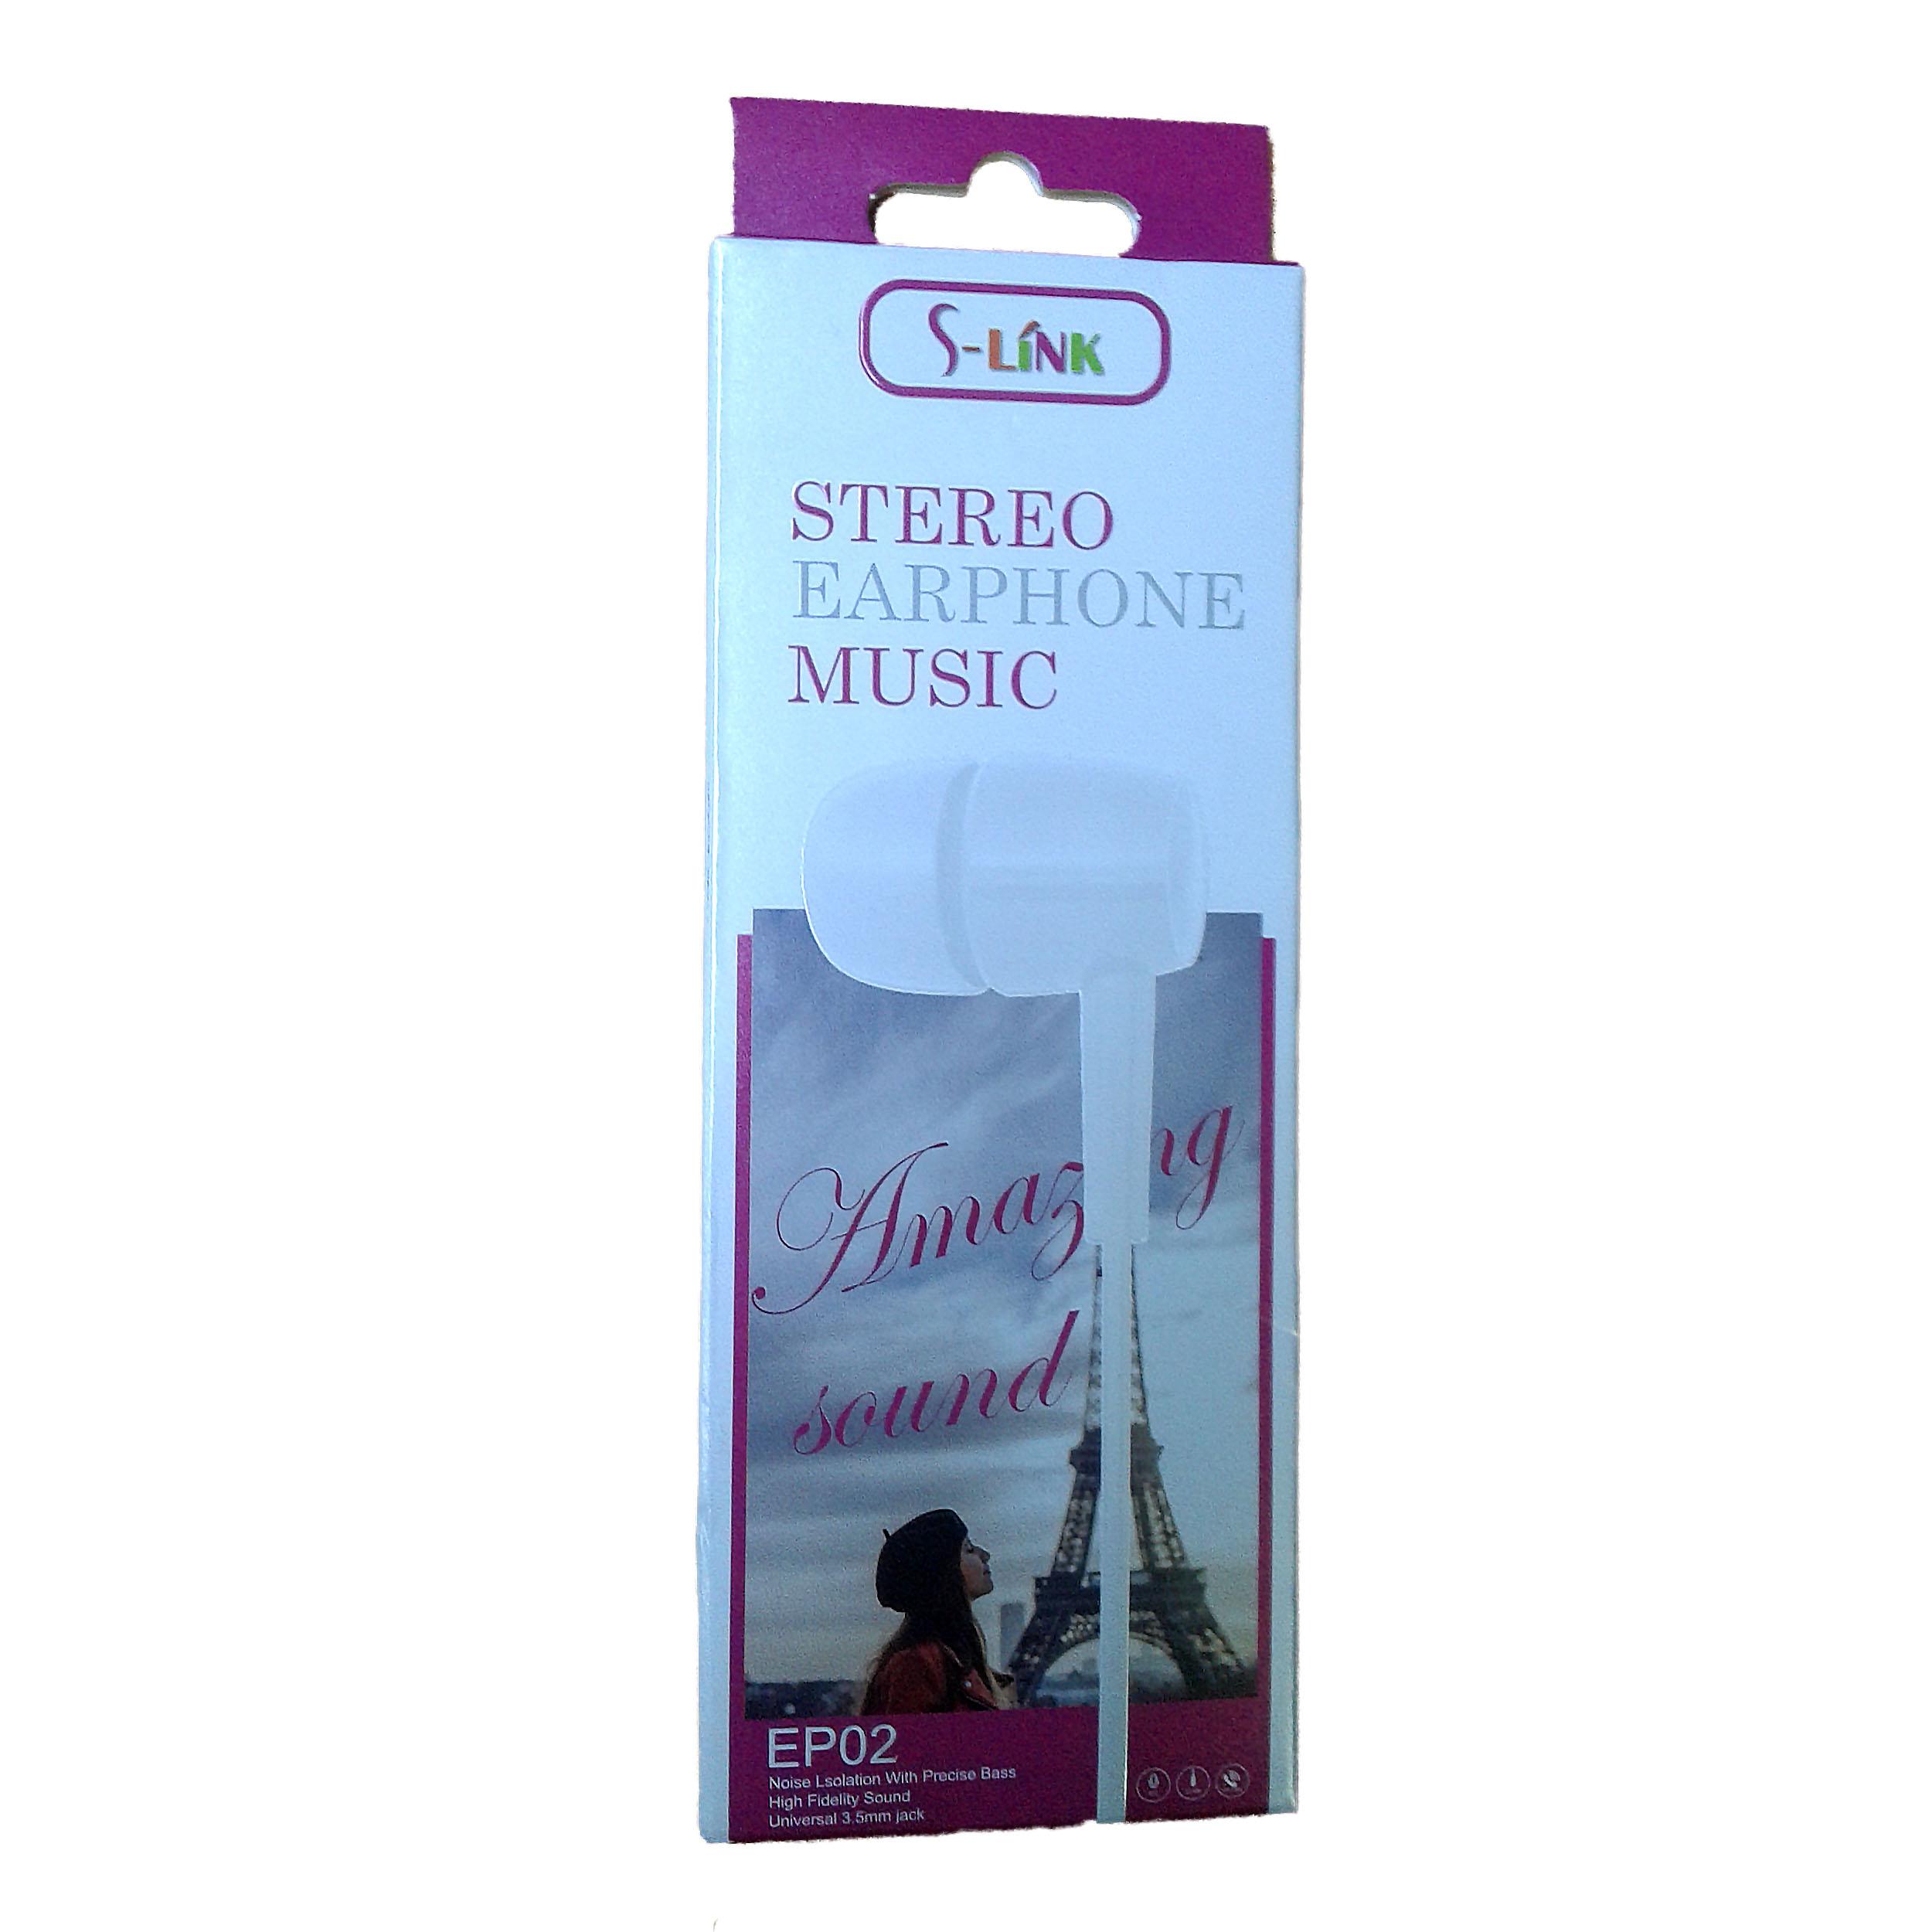 EARPHONE S-LINK FOR SMARTPHONE OR TAB-EP 01/02/03/06  ضغط ,Smartphones & Tab Headsets